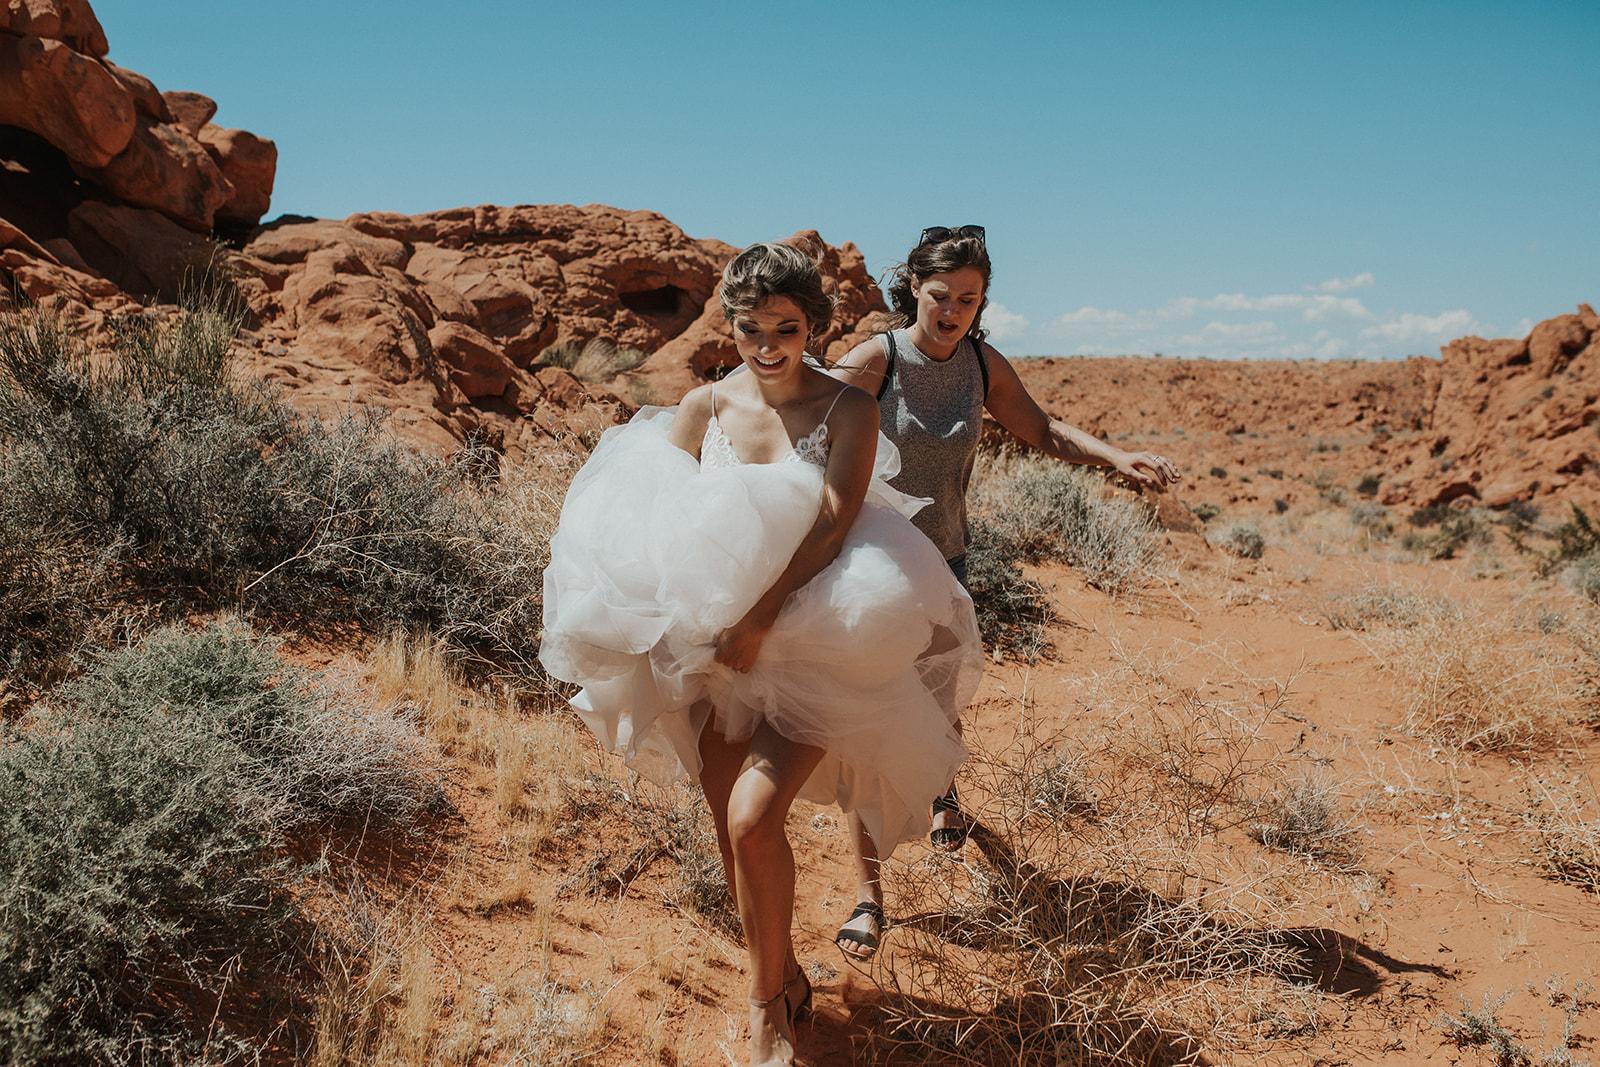 desert portraits set up vegas wedding spokane bride and groom